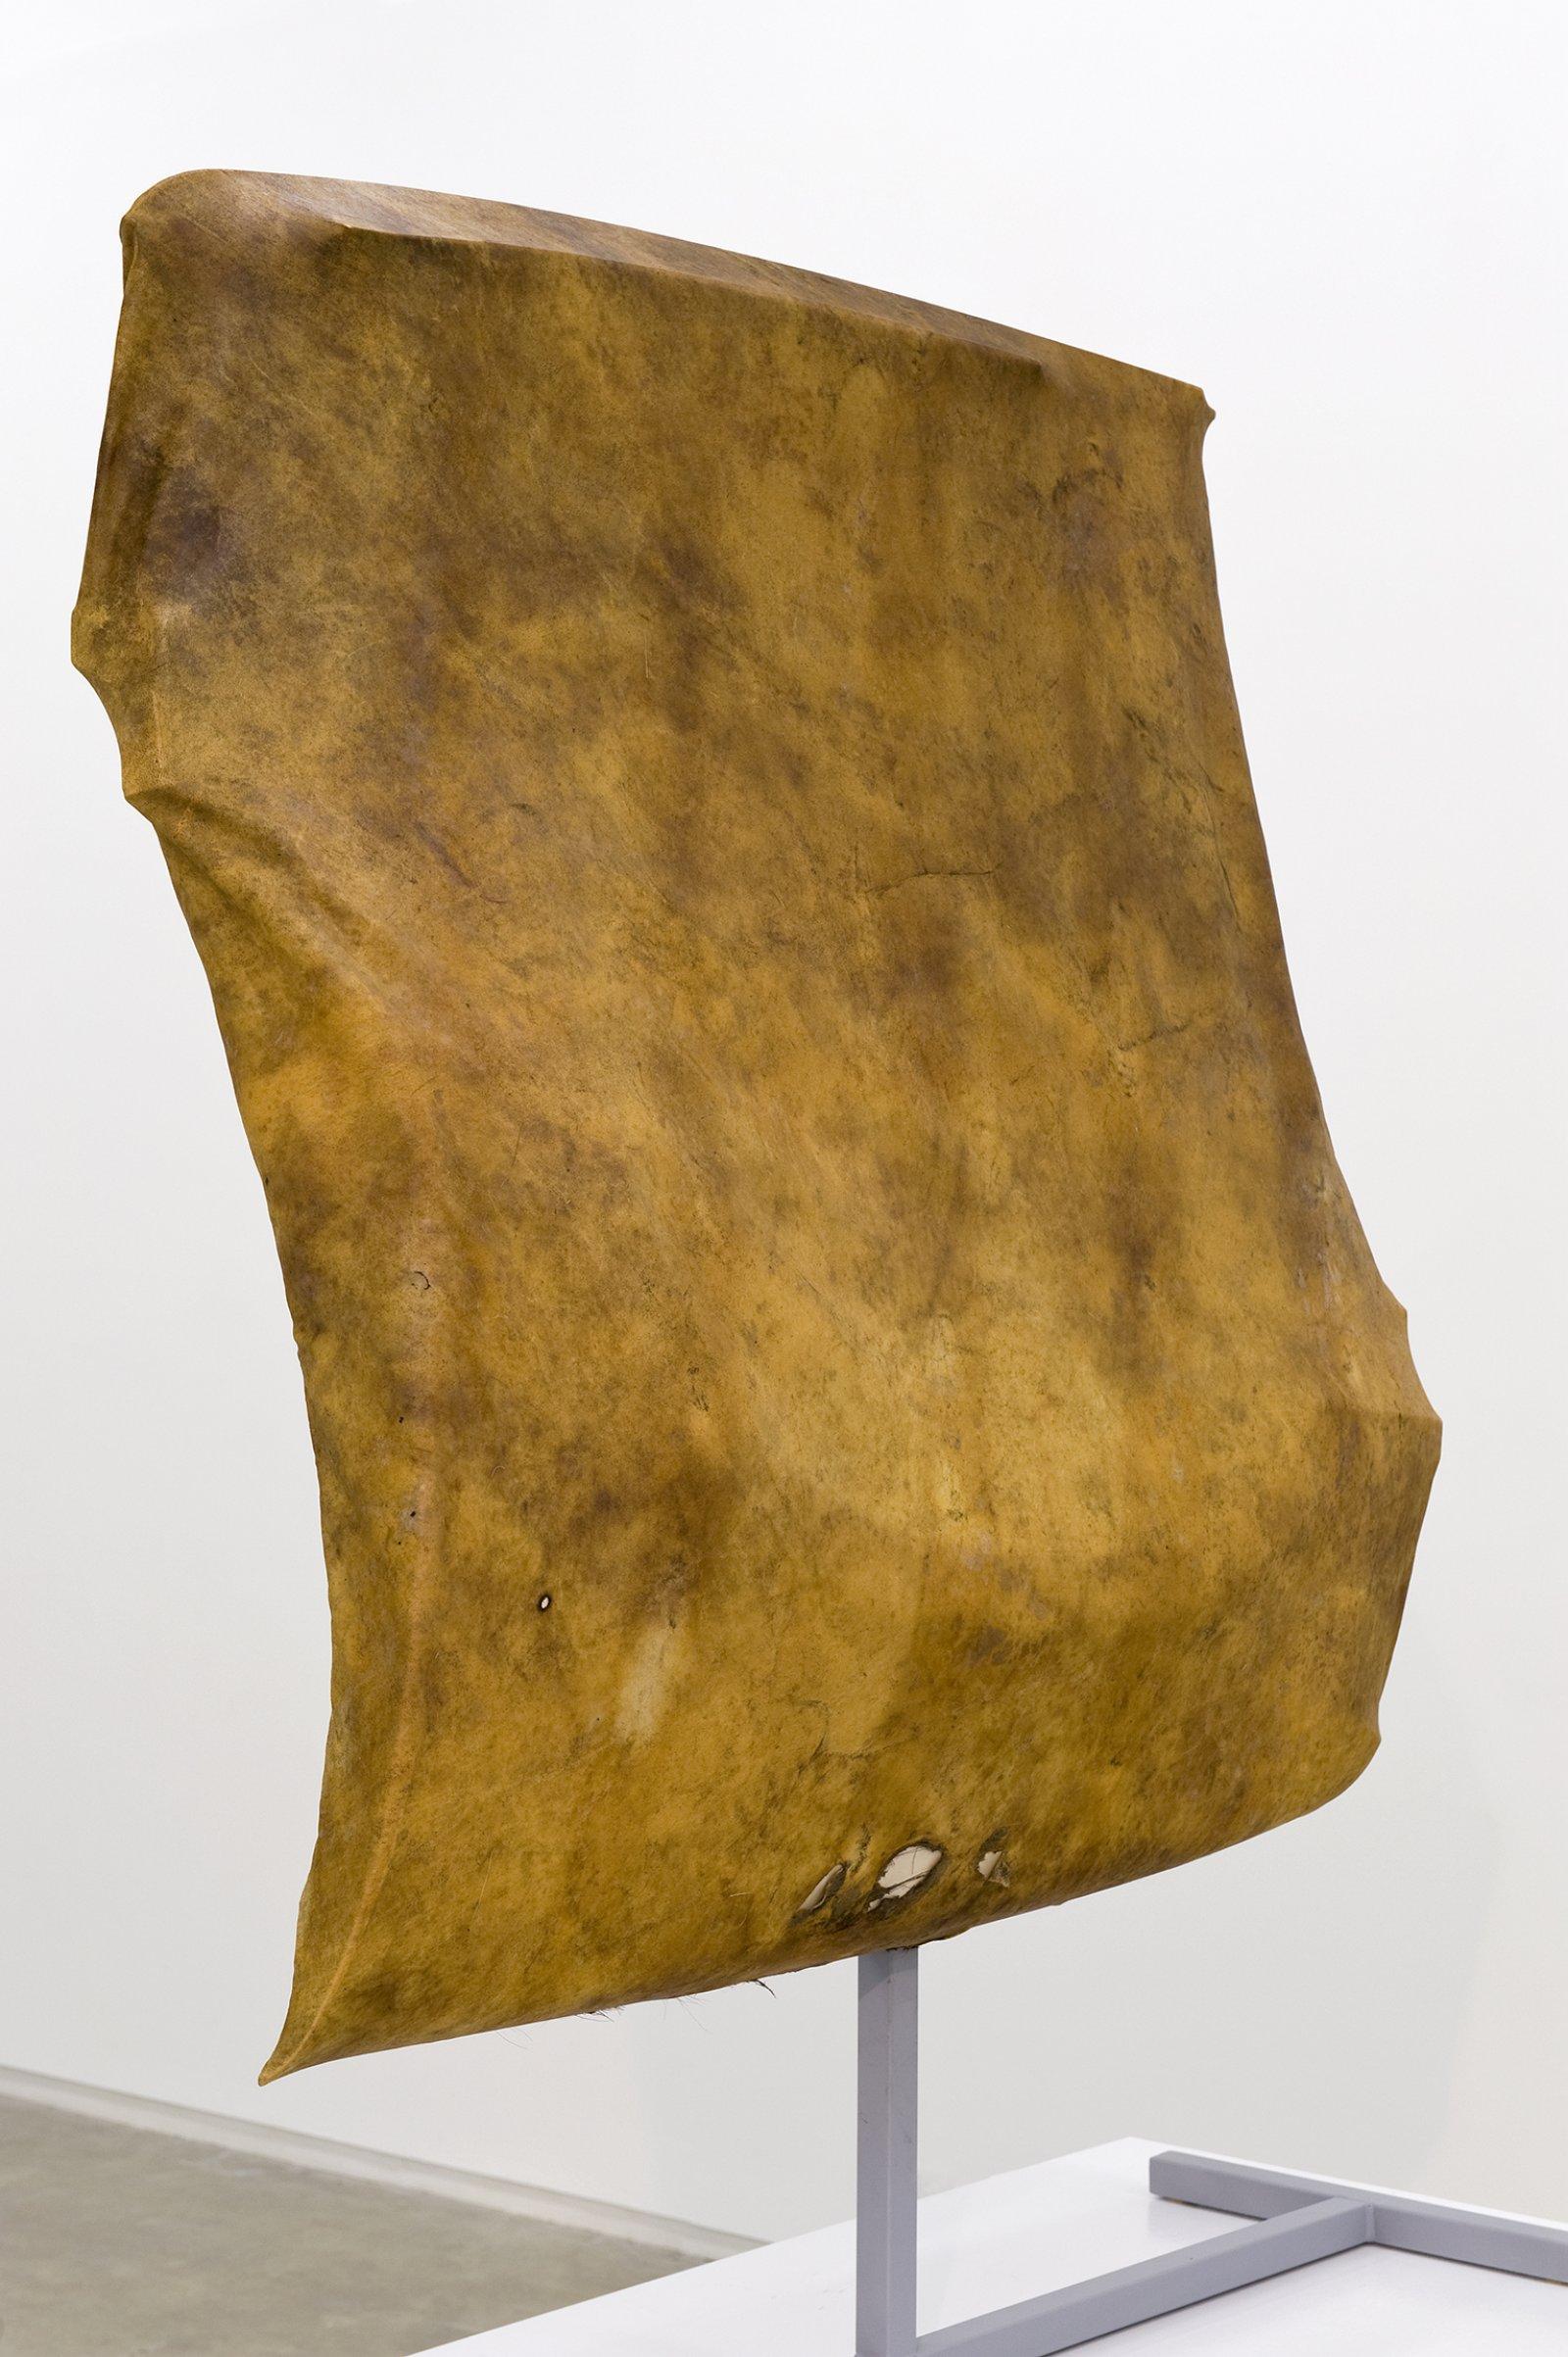 Brian Jungen, Tomorrow, Repeated(detail), 2010, moose hide, car fenders, chest freezer, steel, 96 x 61 x 30 in. (244 x 156 x 75 cm)